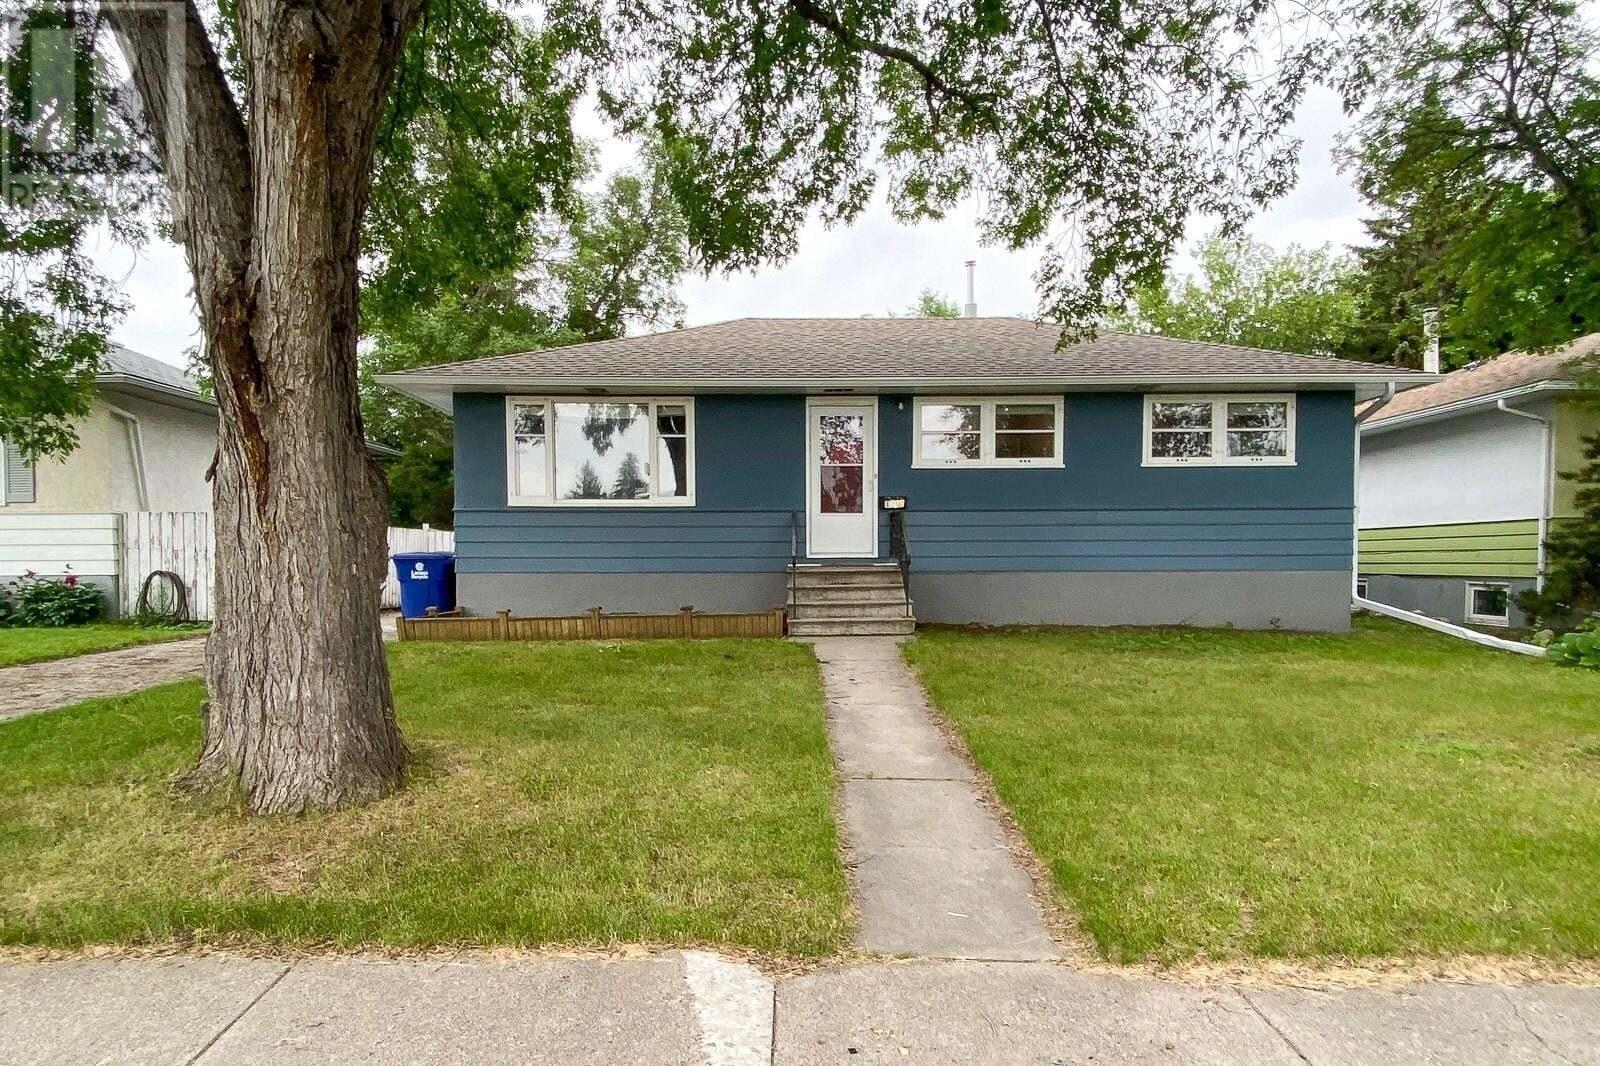 House for sale at 1210 11th St E Saskatoon Saskatchewan - MLS: SK817279